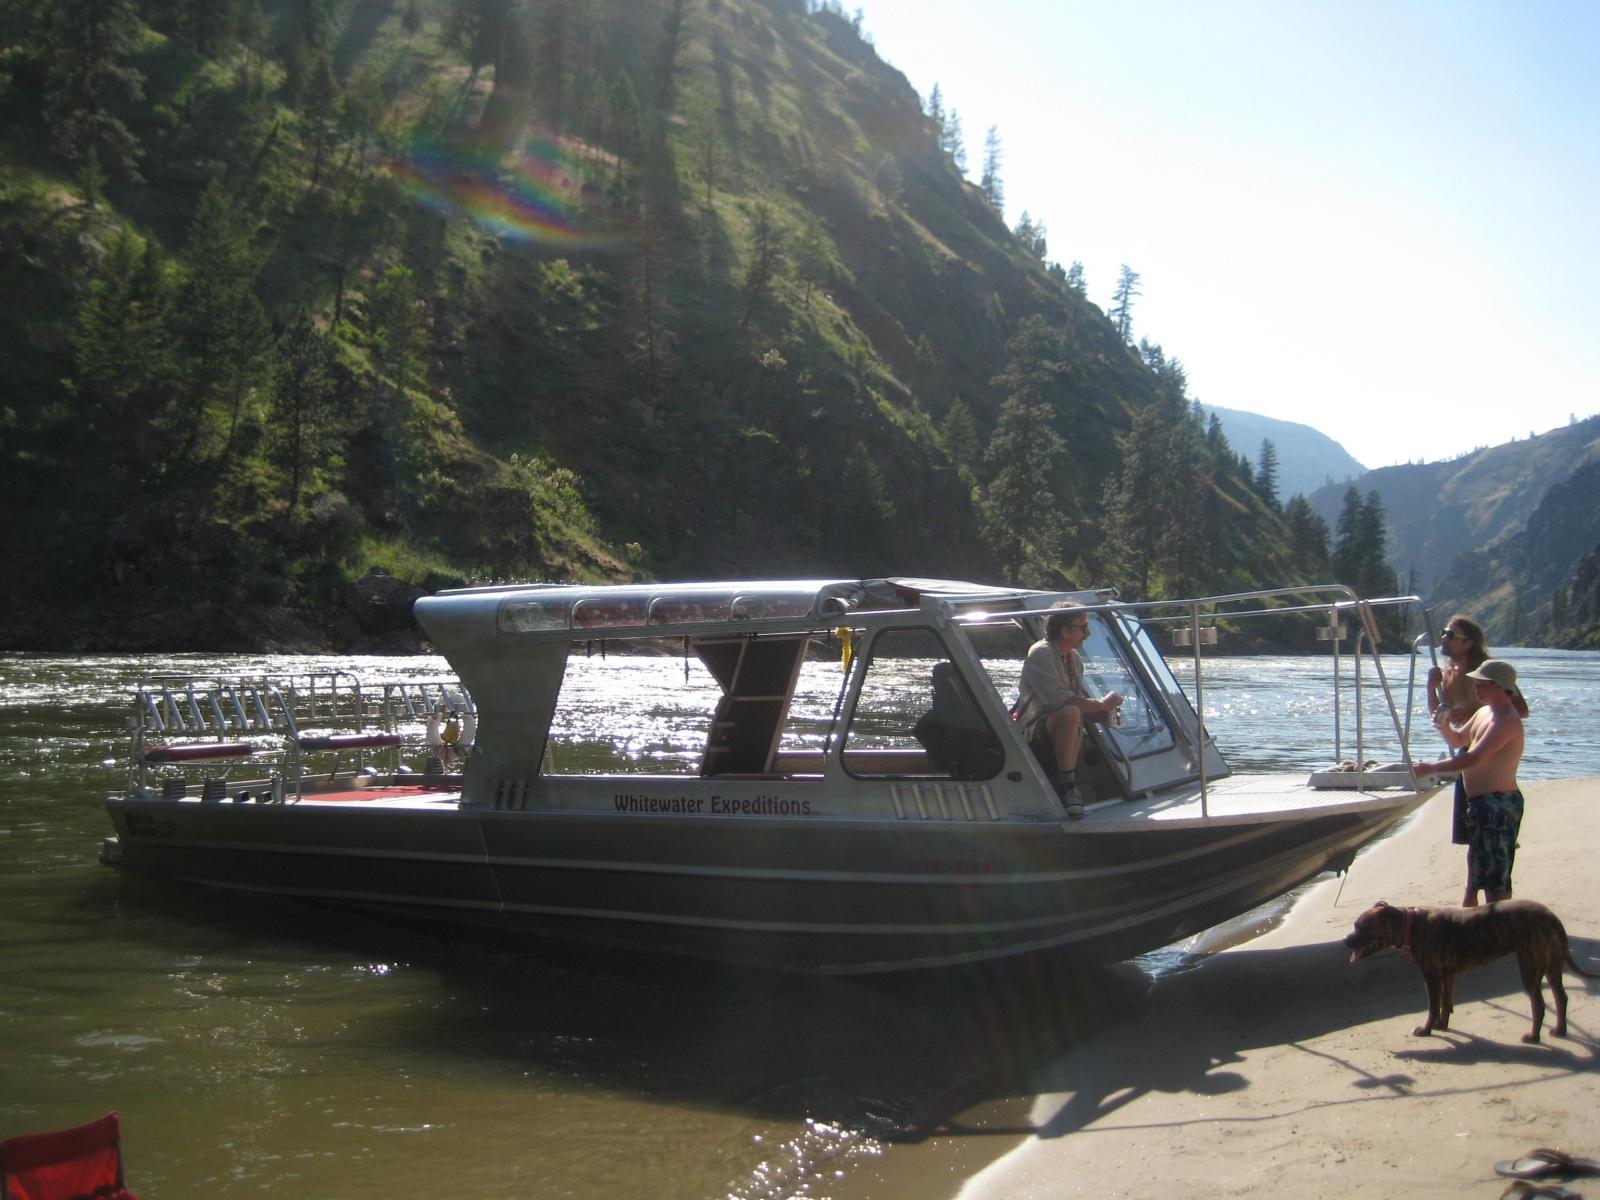 Click image for larger version  Name:2009 kayaking 465.jpg Views:167 Size:511.8 KB ID:2002